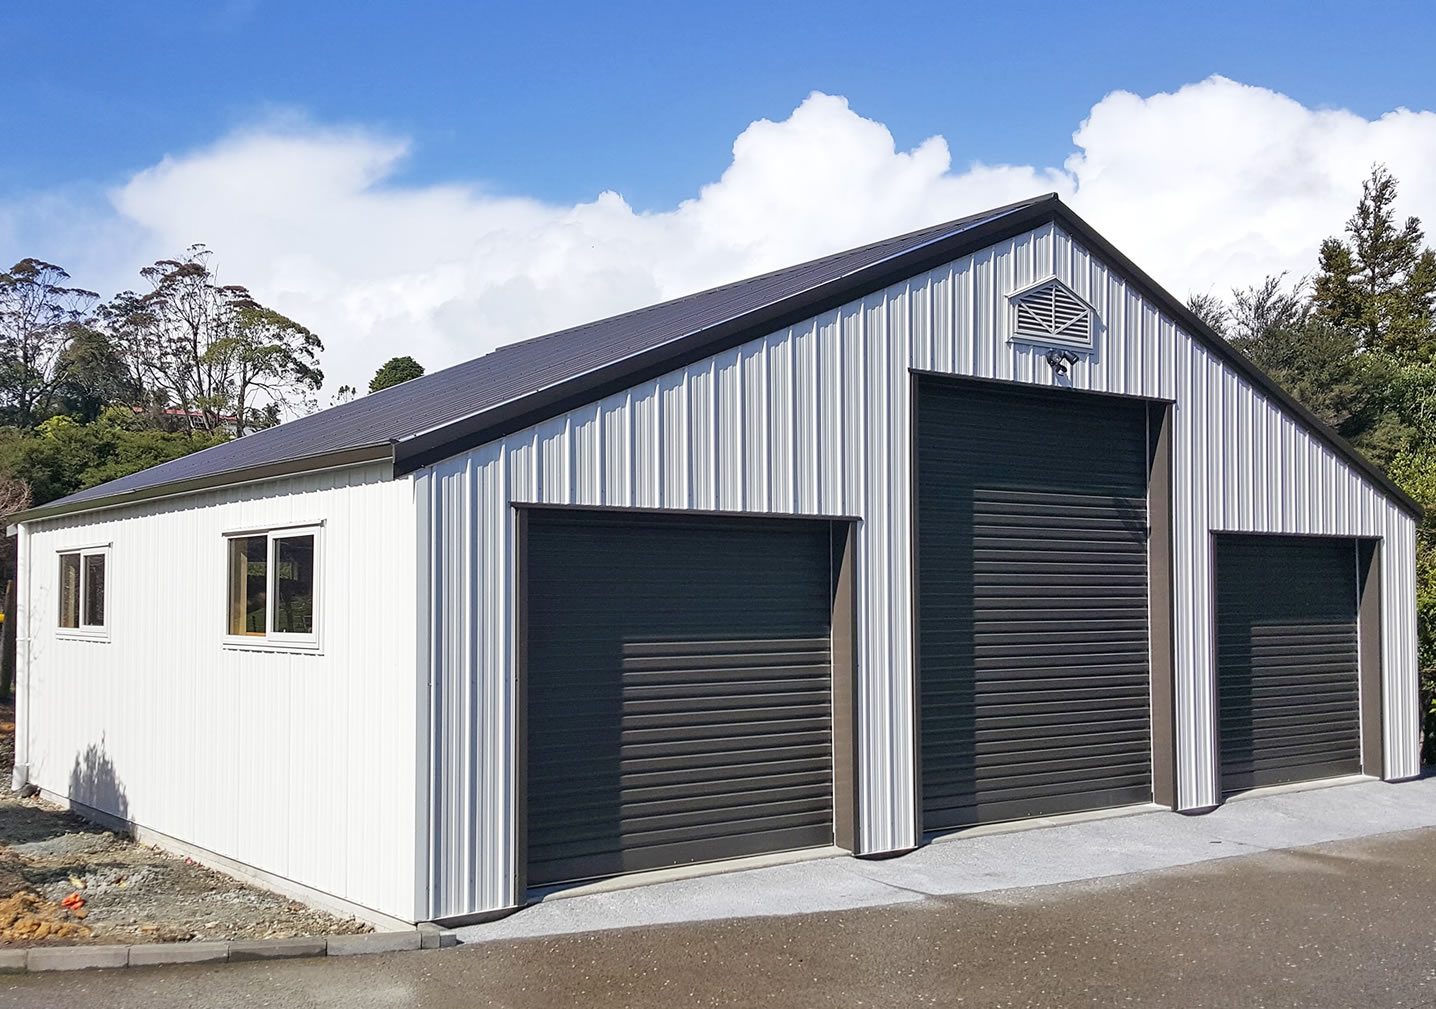 RV Garage Metal Buildings: Uses and Benefits